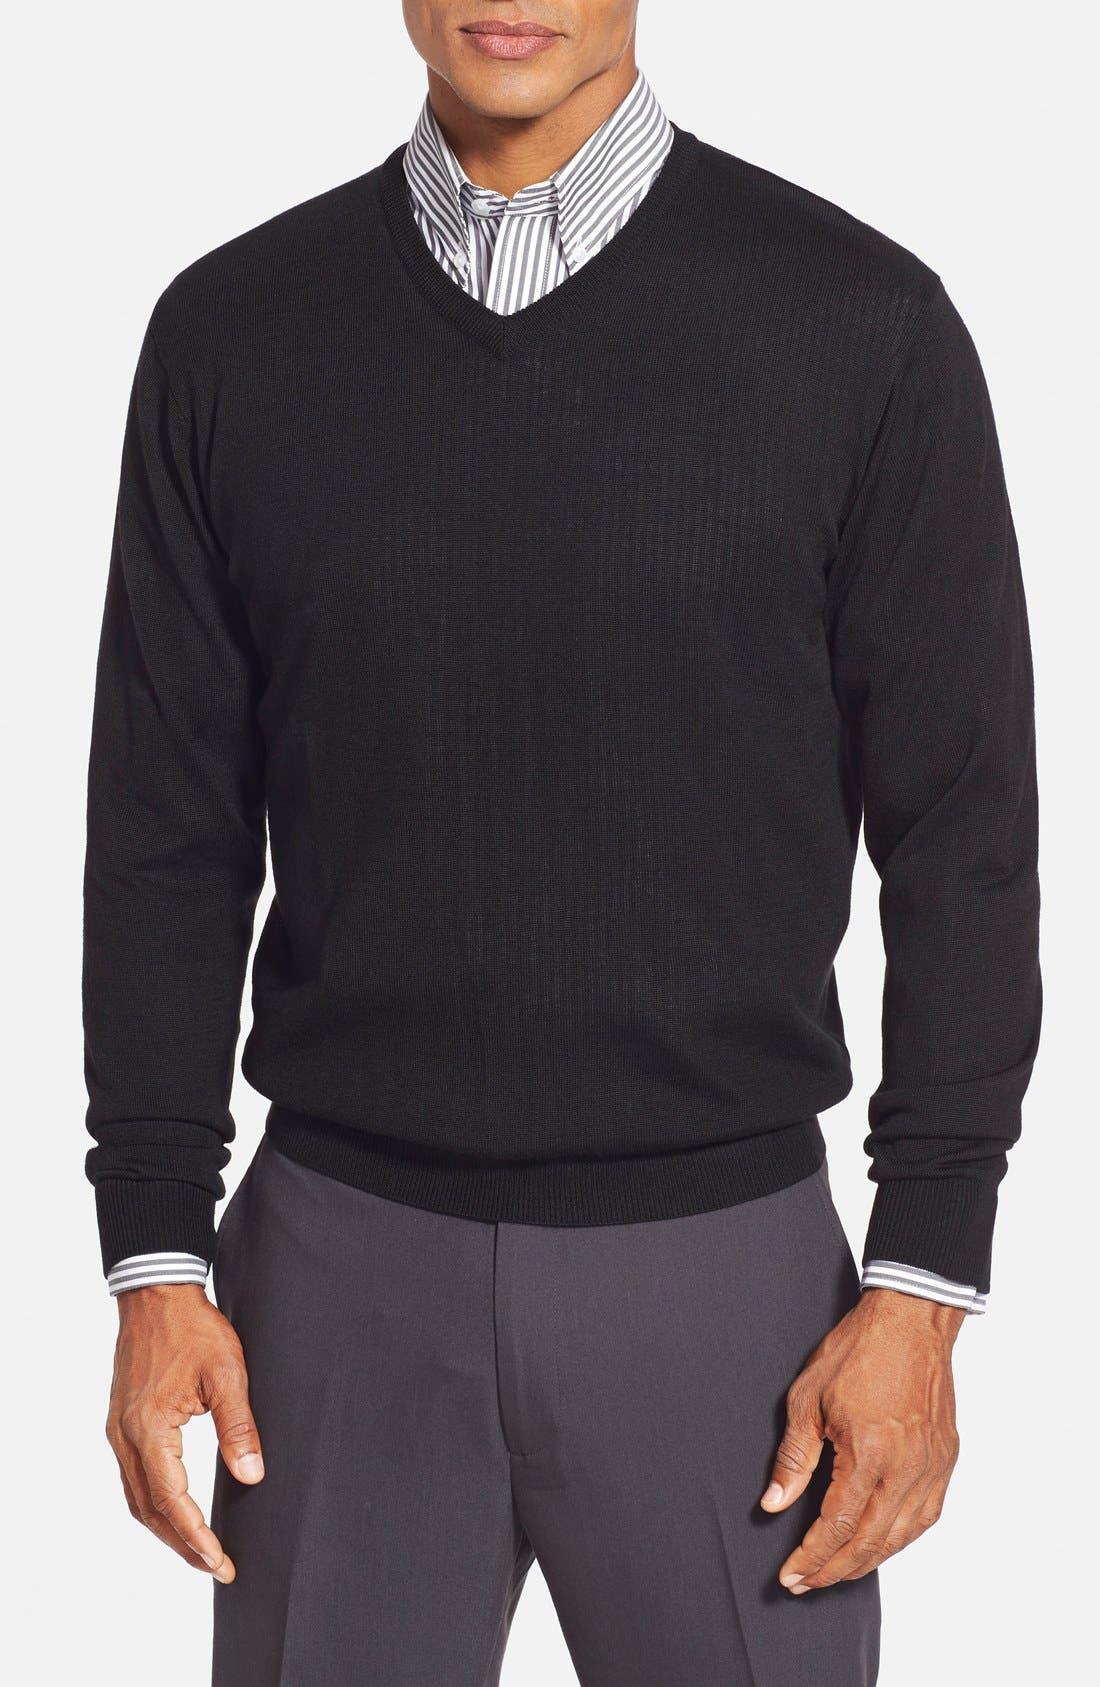 'Douglas' Merino Wool Blend V-Neck Sweater,                         Main,                         color, Black